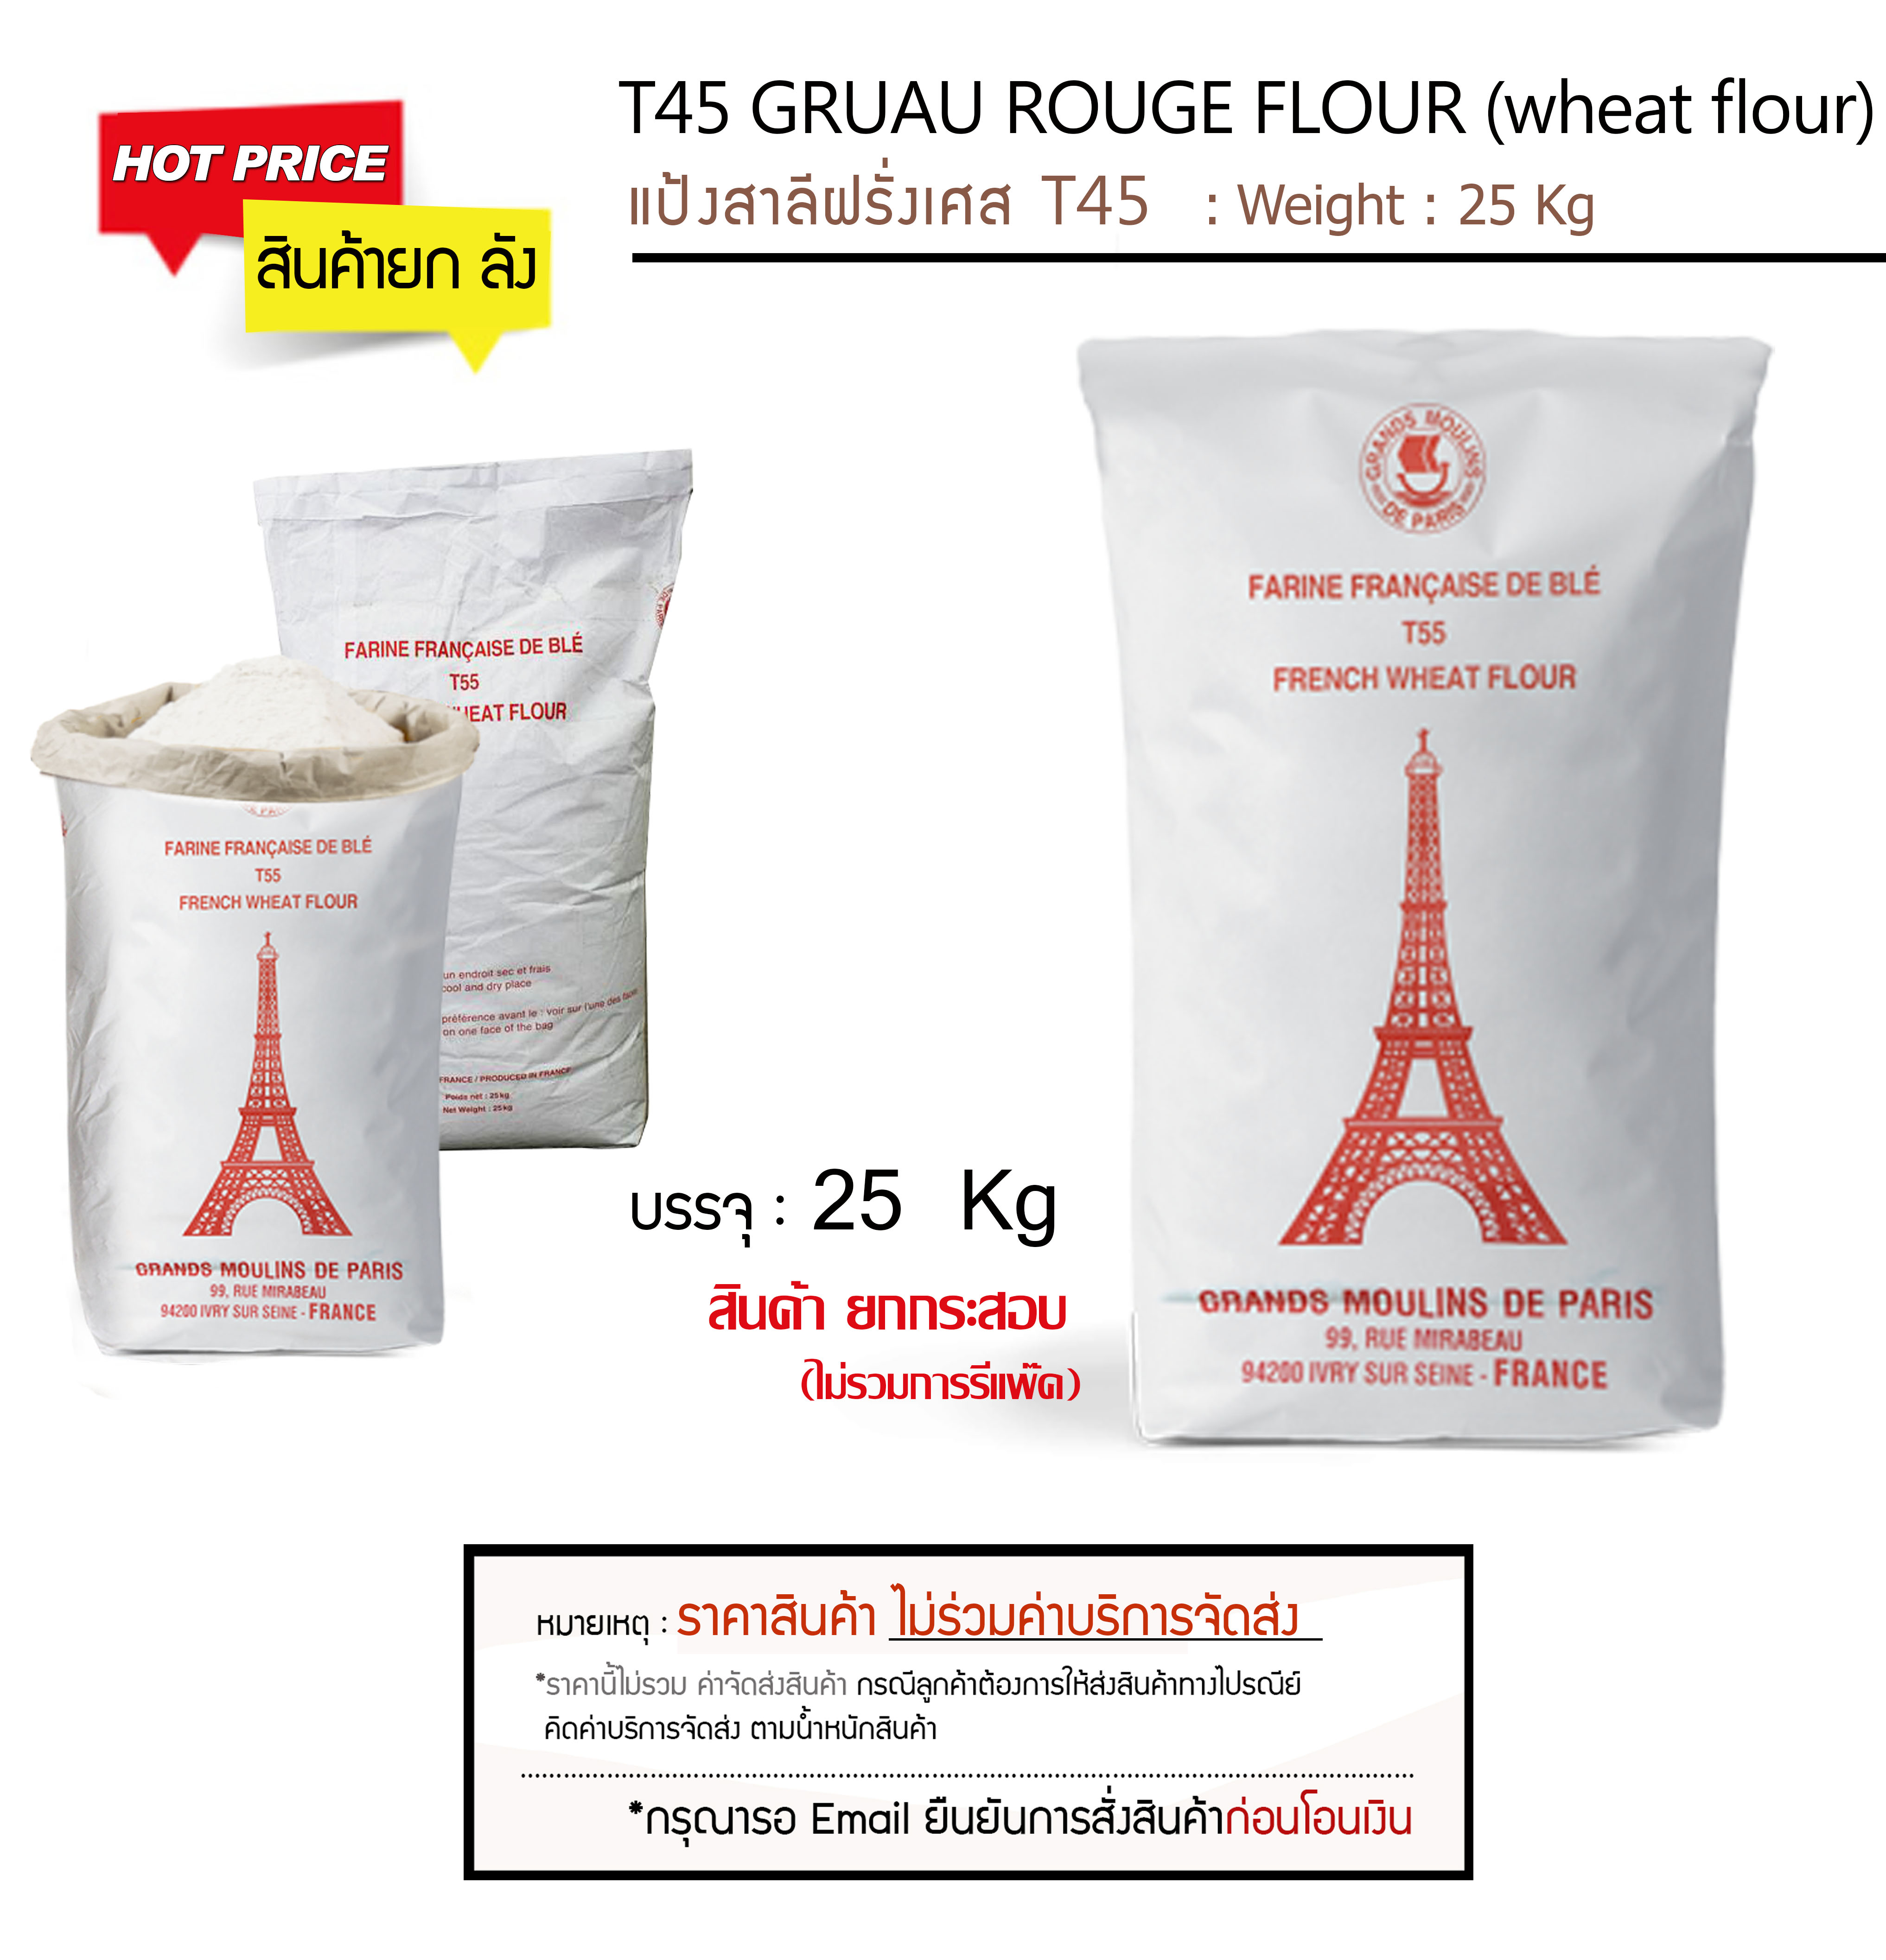 T55 FRENCH WHEAT FLOUR (French All Purpose Flour) แป้งอเนกประสงค์ขนาด ขนาด 25 kg